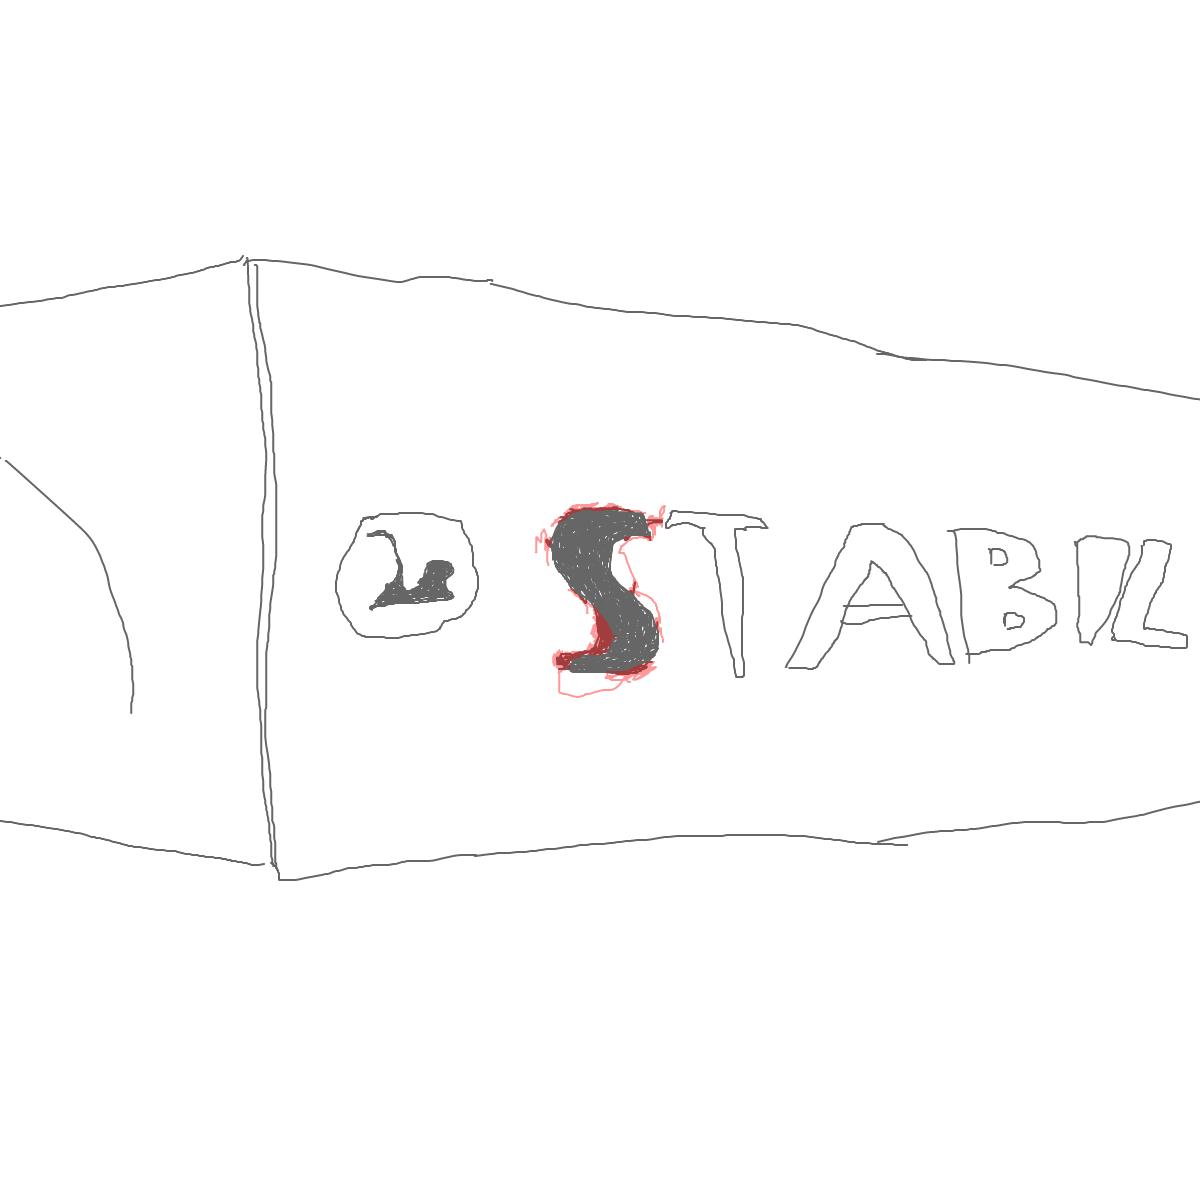 BAAAM drawing#17405 lat:51.2067070007324200lng: 3.2594110965728760